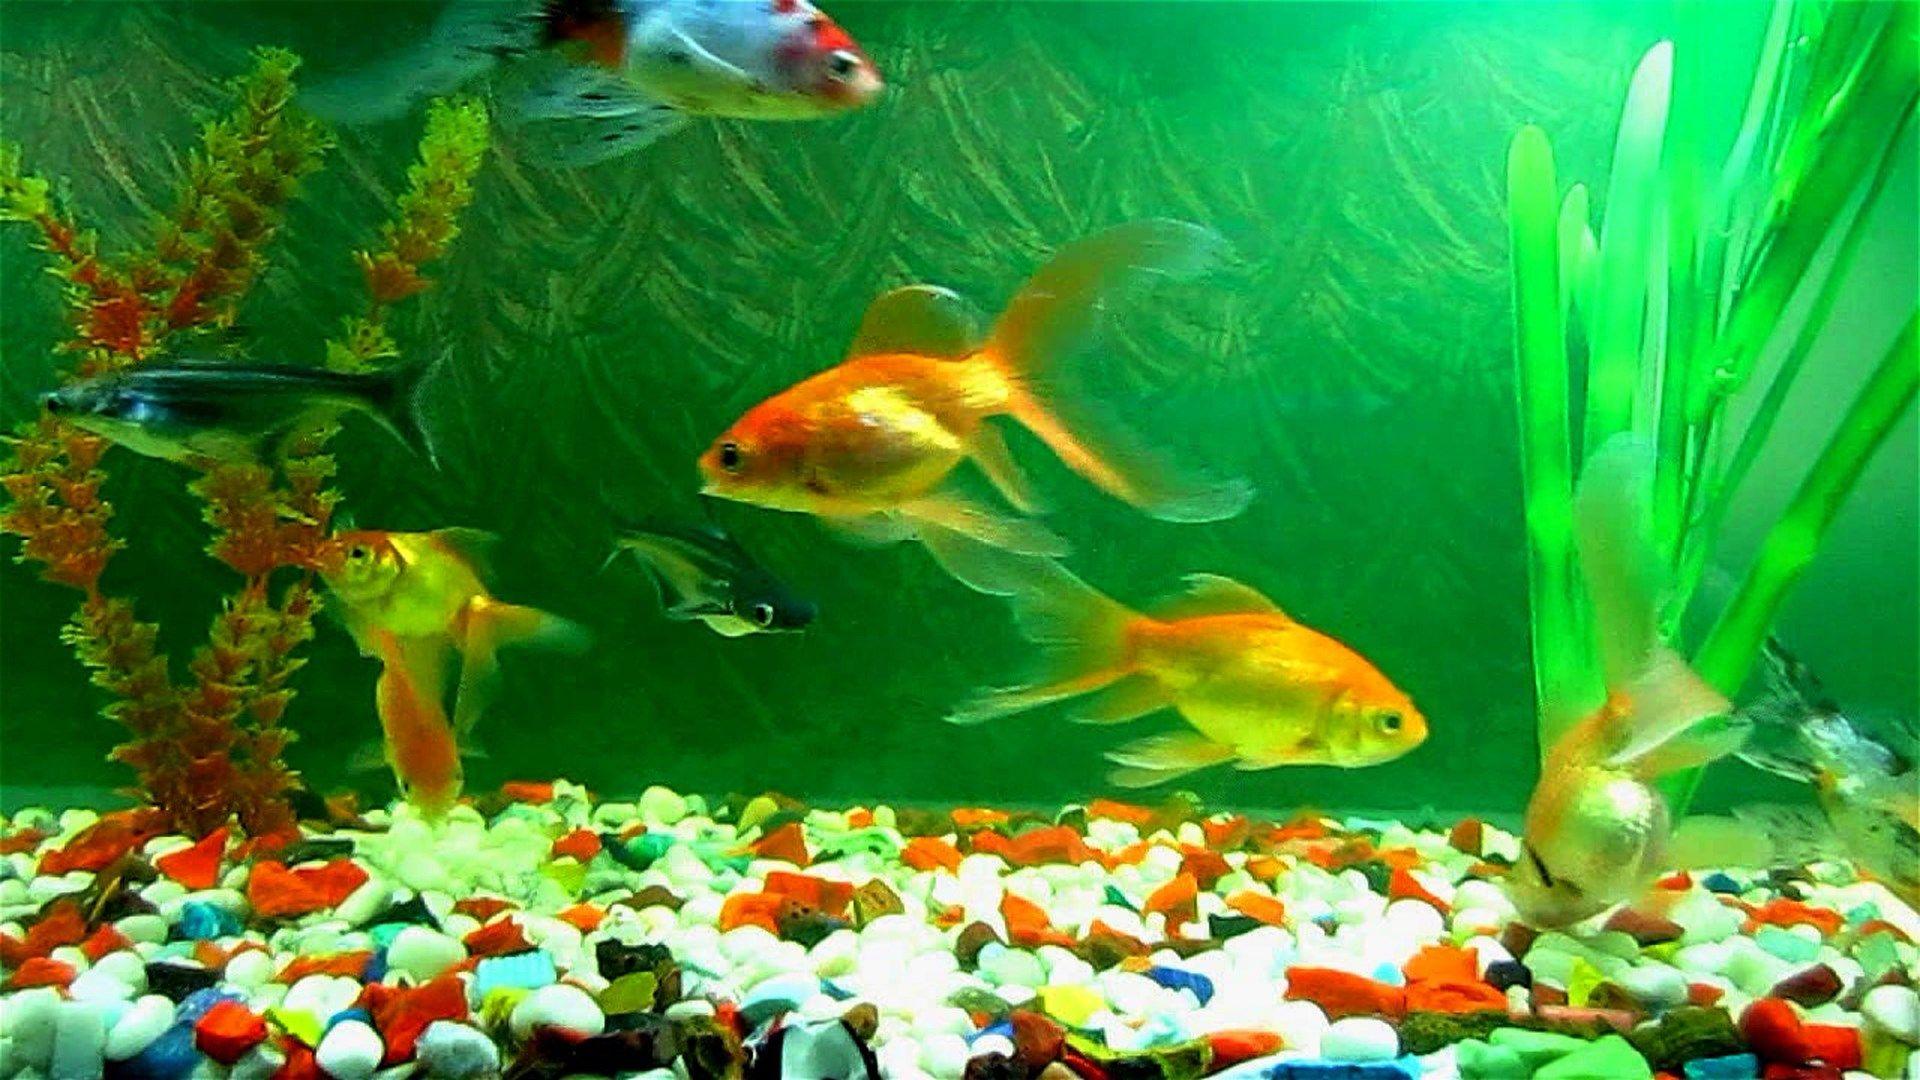 aquarium fish tank wallpaper hd 1080p | ololoshenka | Fish ...